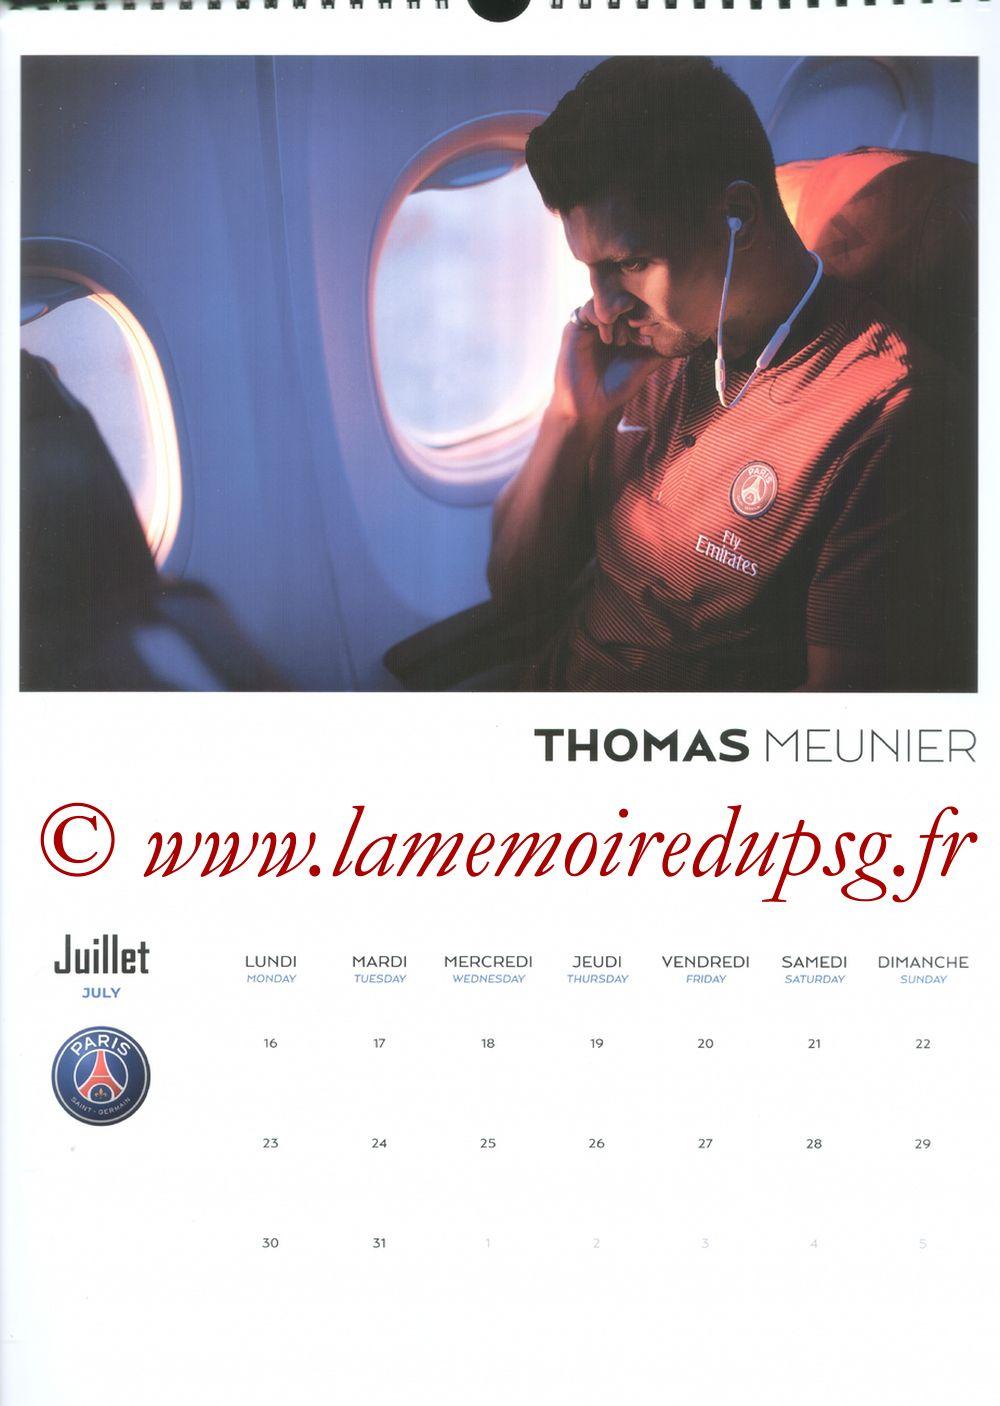 Calendrier PSG 2018 - Page 14 - Thomas MEUNIER